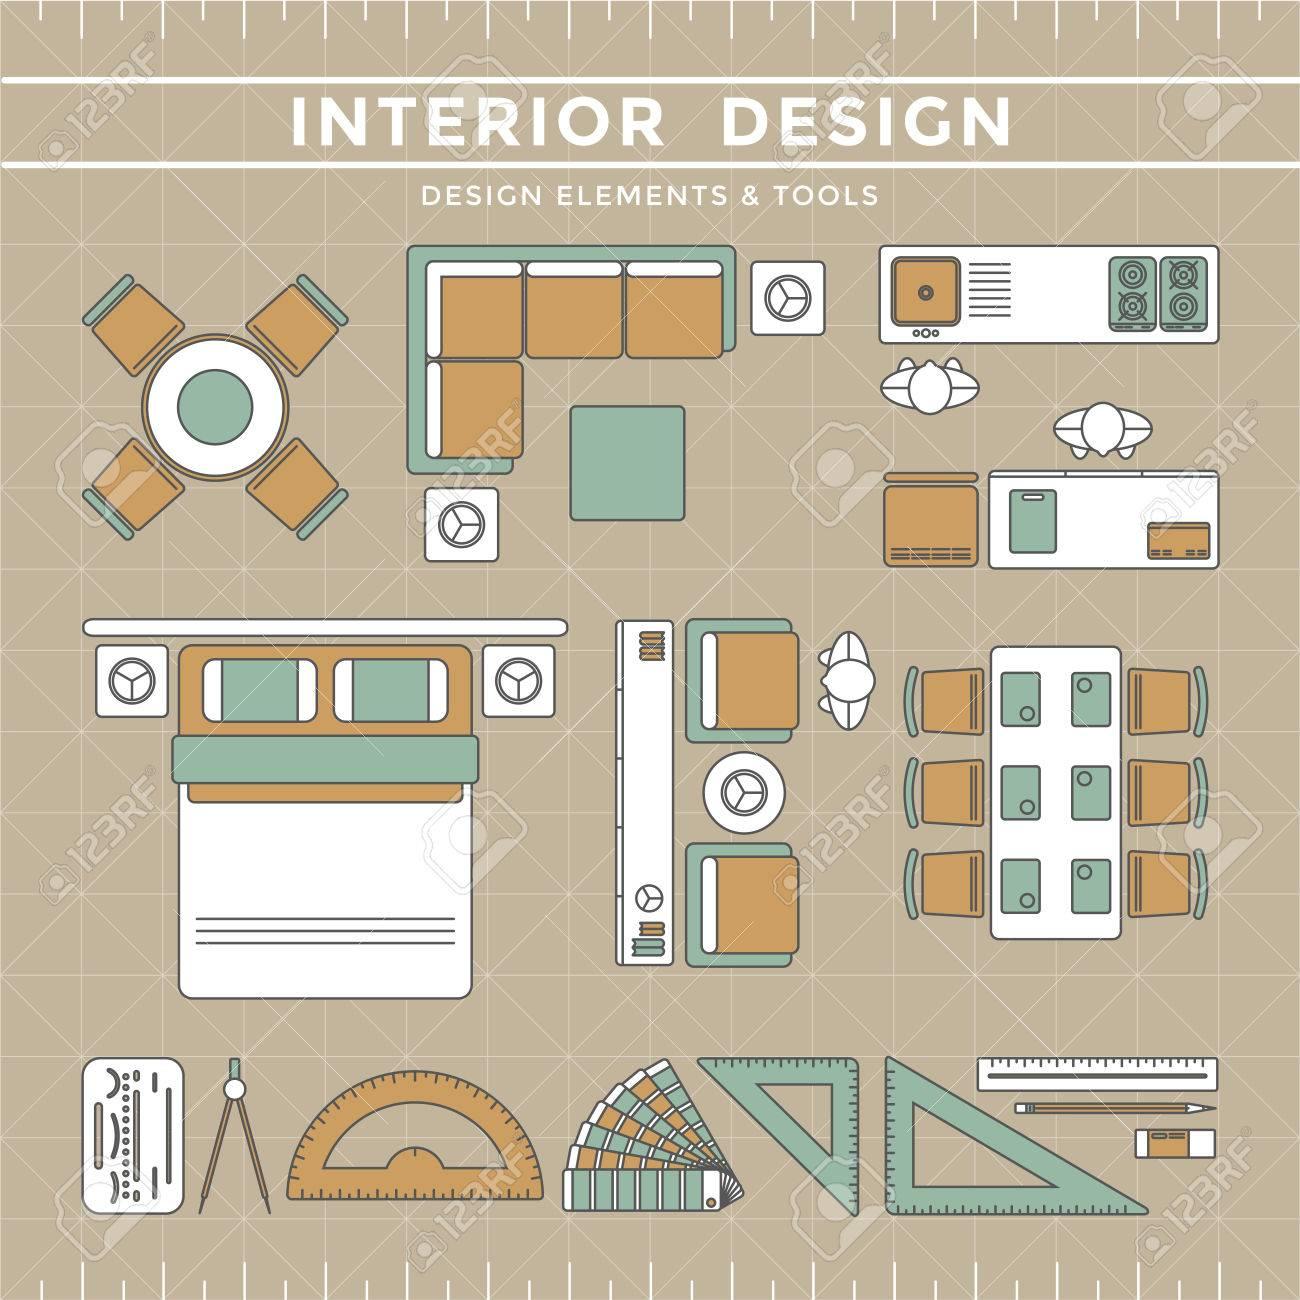 Interior Design Elements Equipment Tools - 39526135